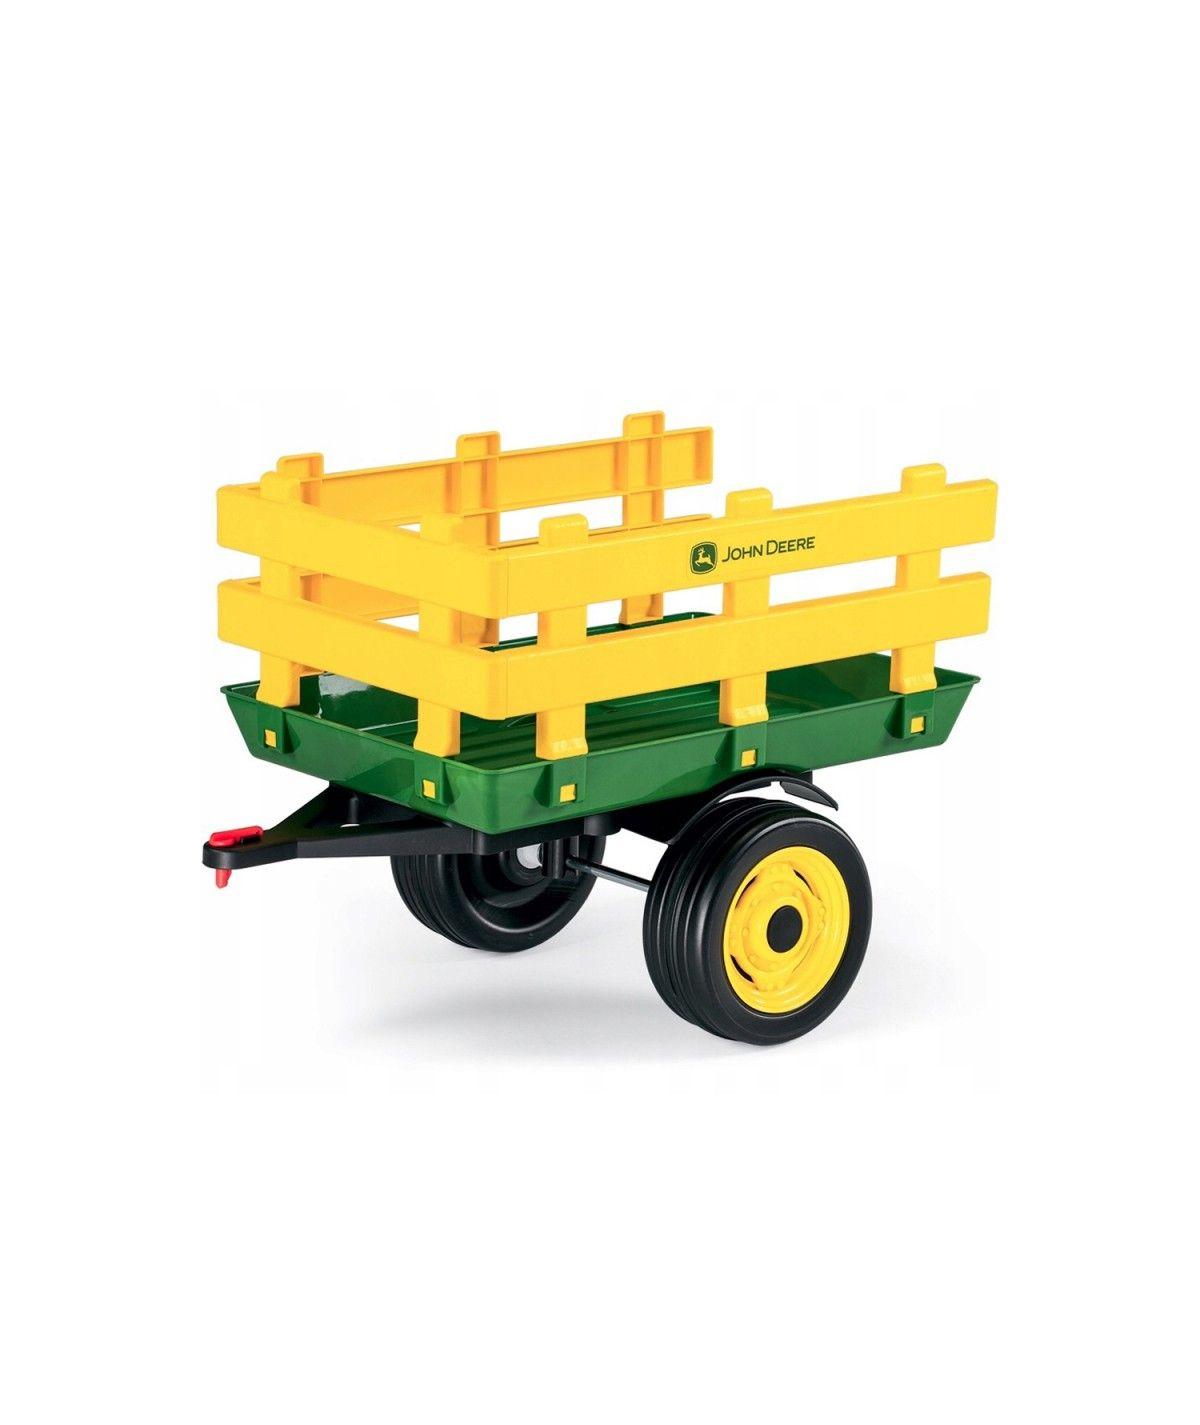 Traktorki I Akcesoria 3 Wooden Toy Car Toy Car Wooden Toys